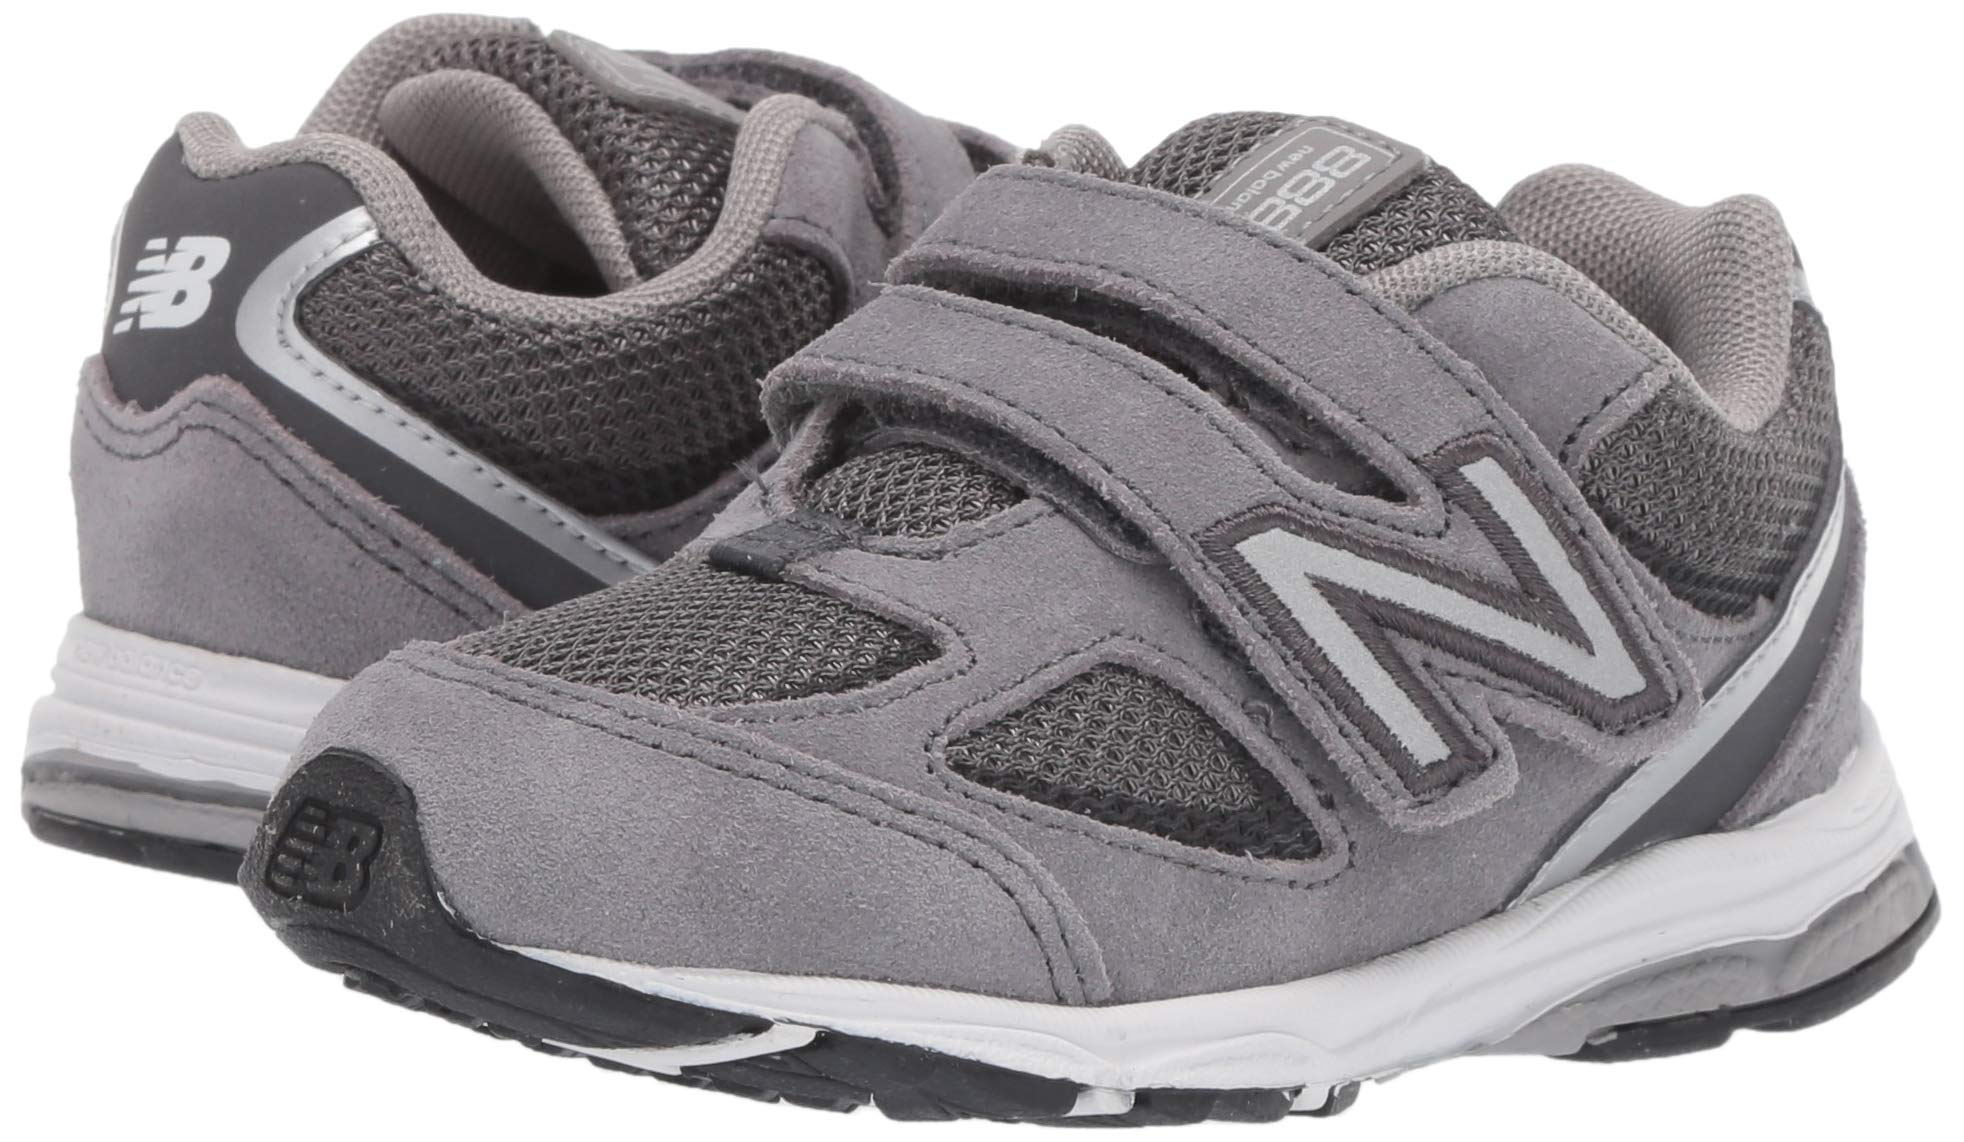 New Balance Boys' 888v2 Hook and Loop Running Shoe, Dark Grey, 2 M US Infant by New Balance (Image #5)